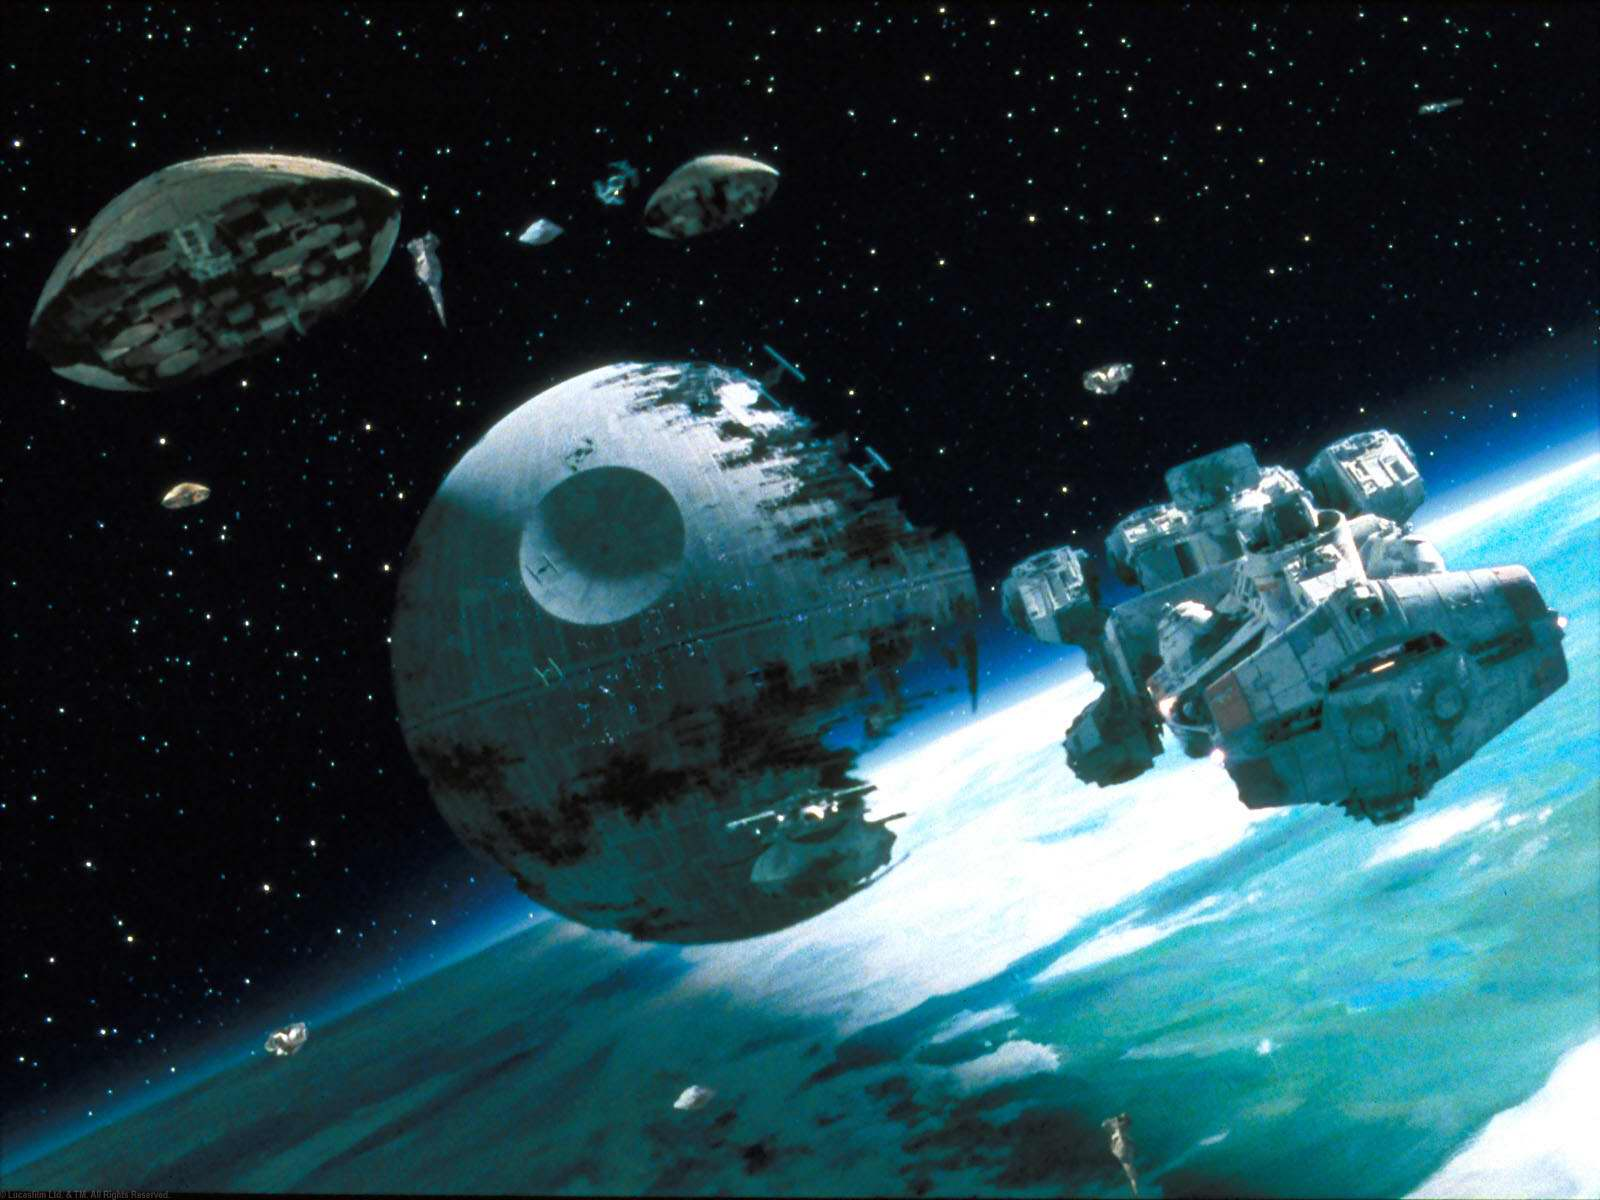 Star Wars Ships Wallpapers Top Free Star Wars Ships